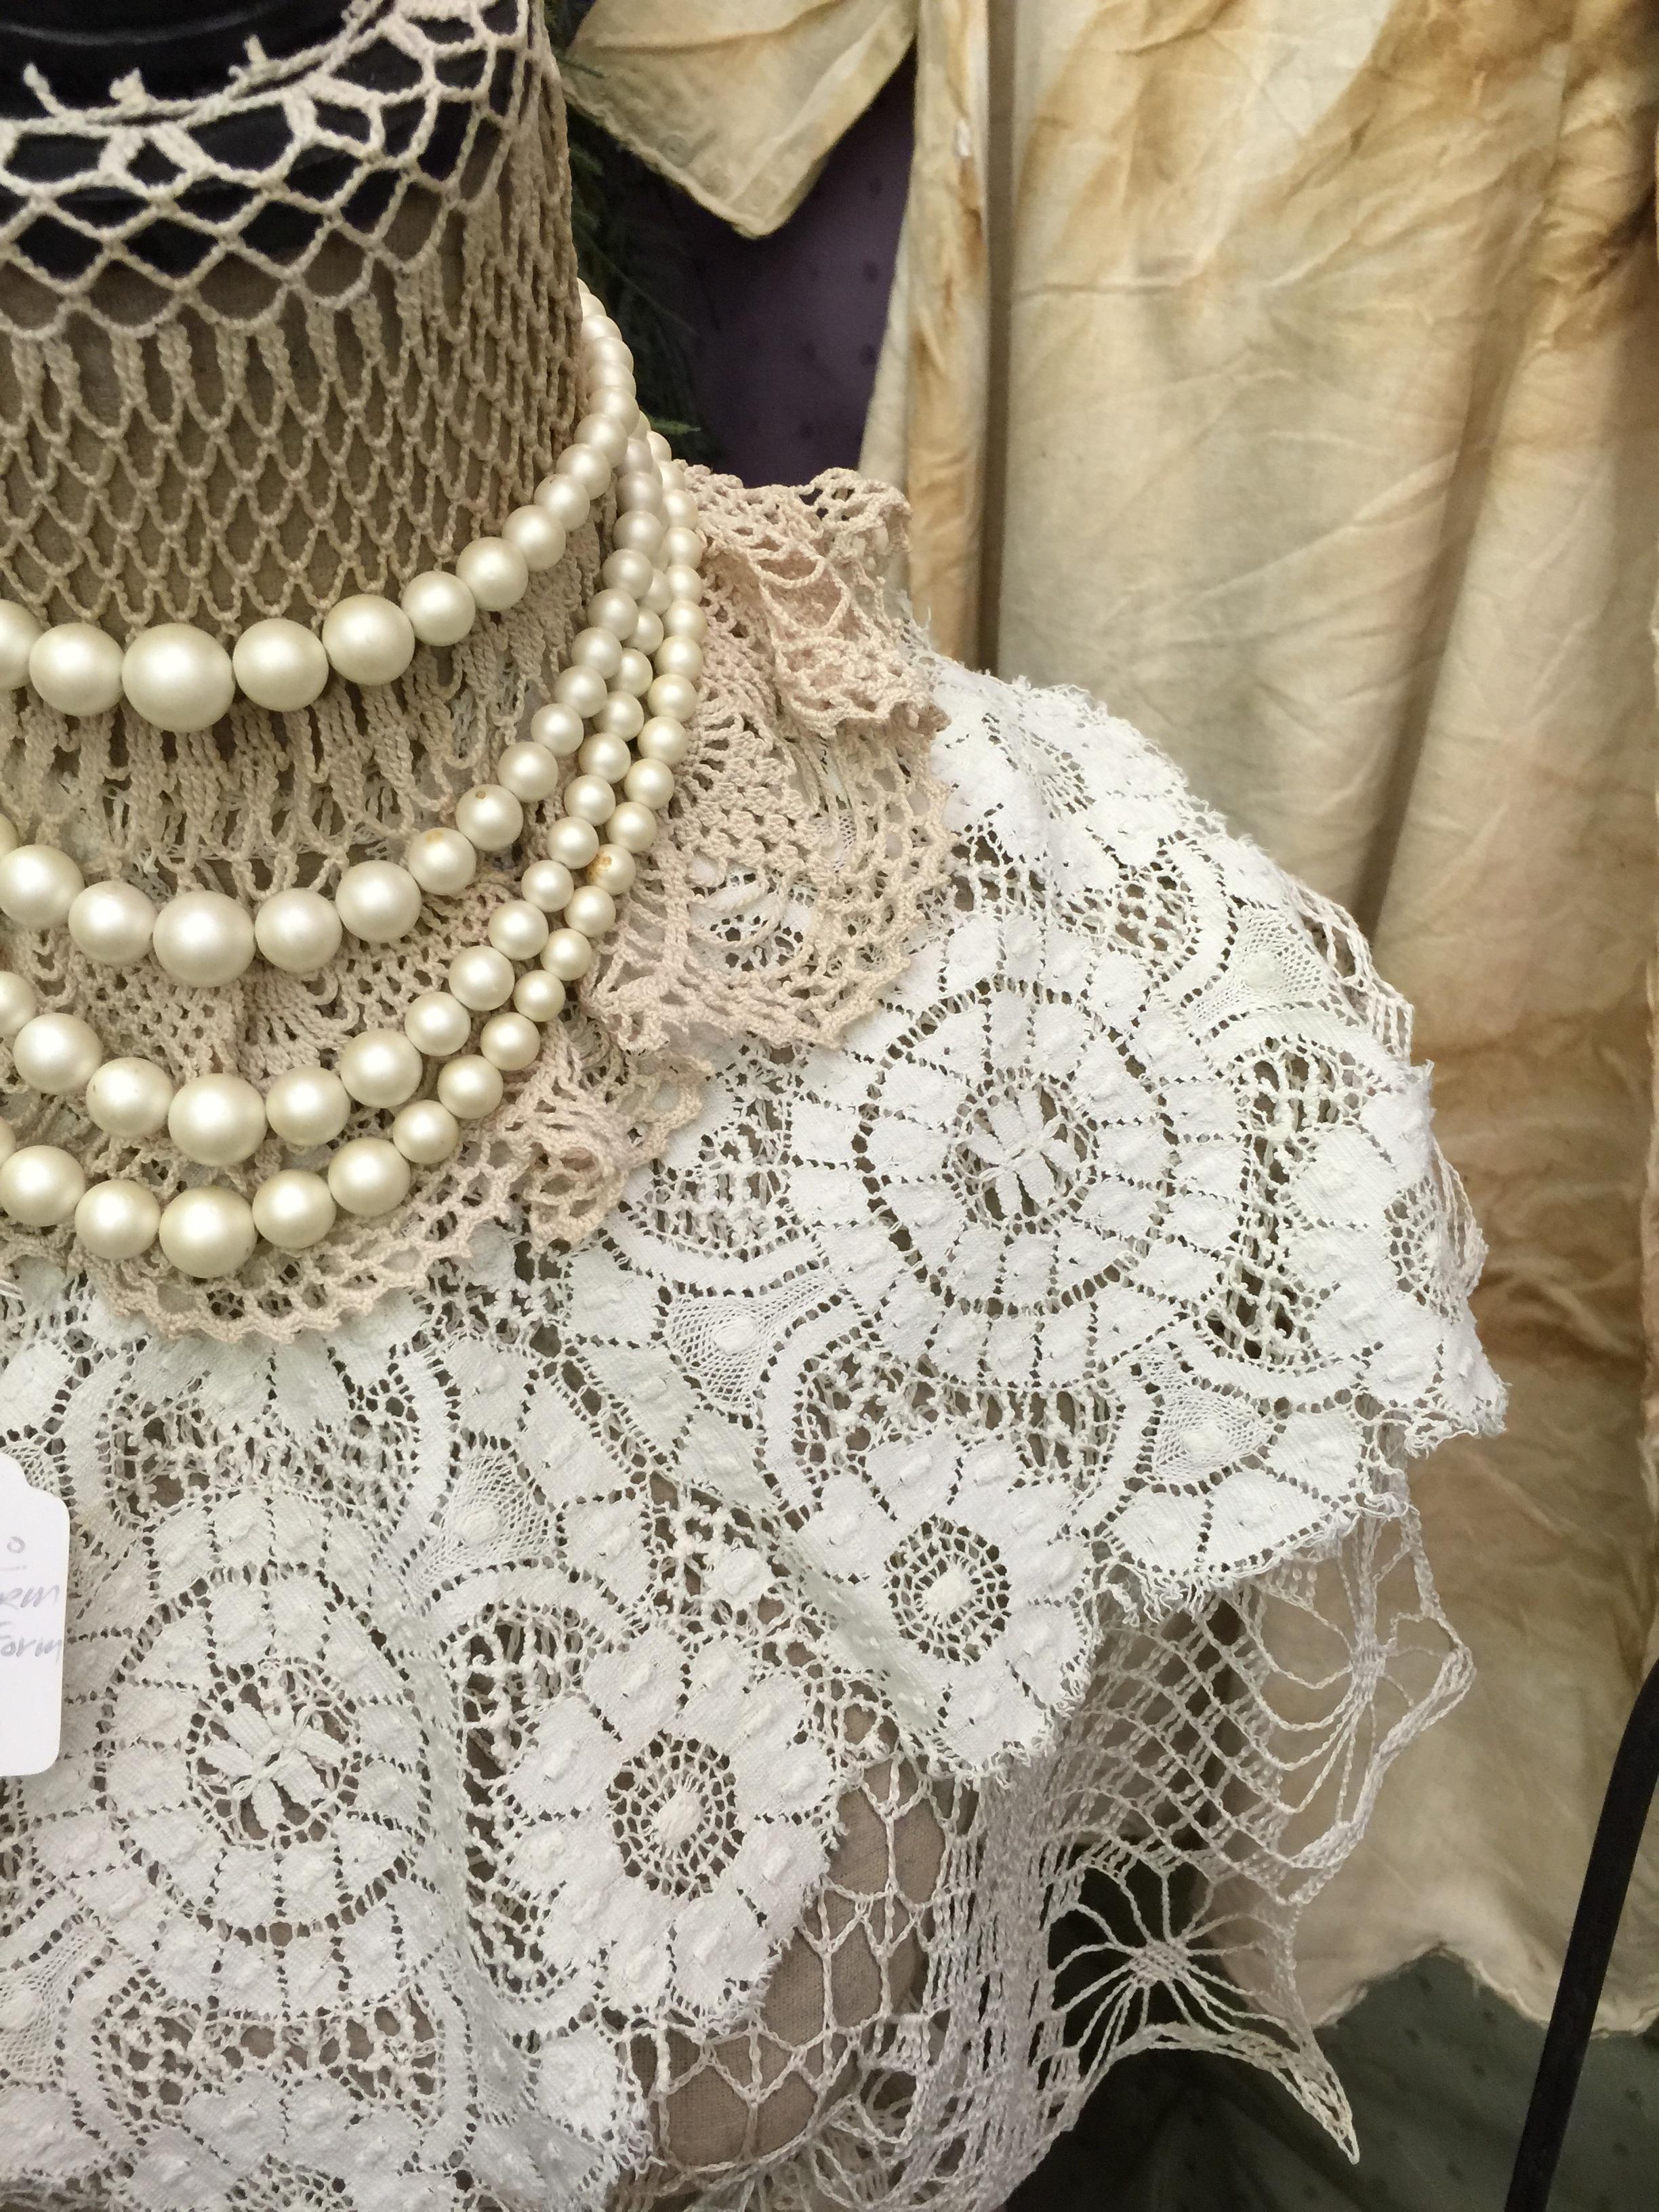 Fotos gratis : blanco, antiguo, hembra, patrón, cordón, ropa ...